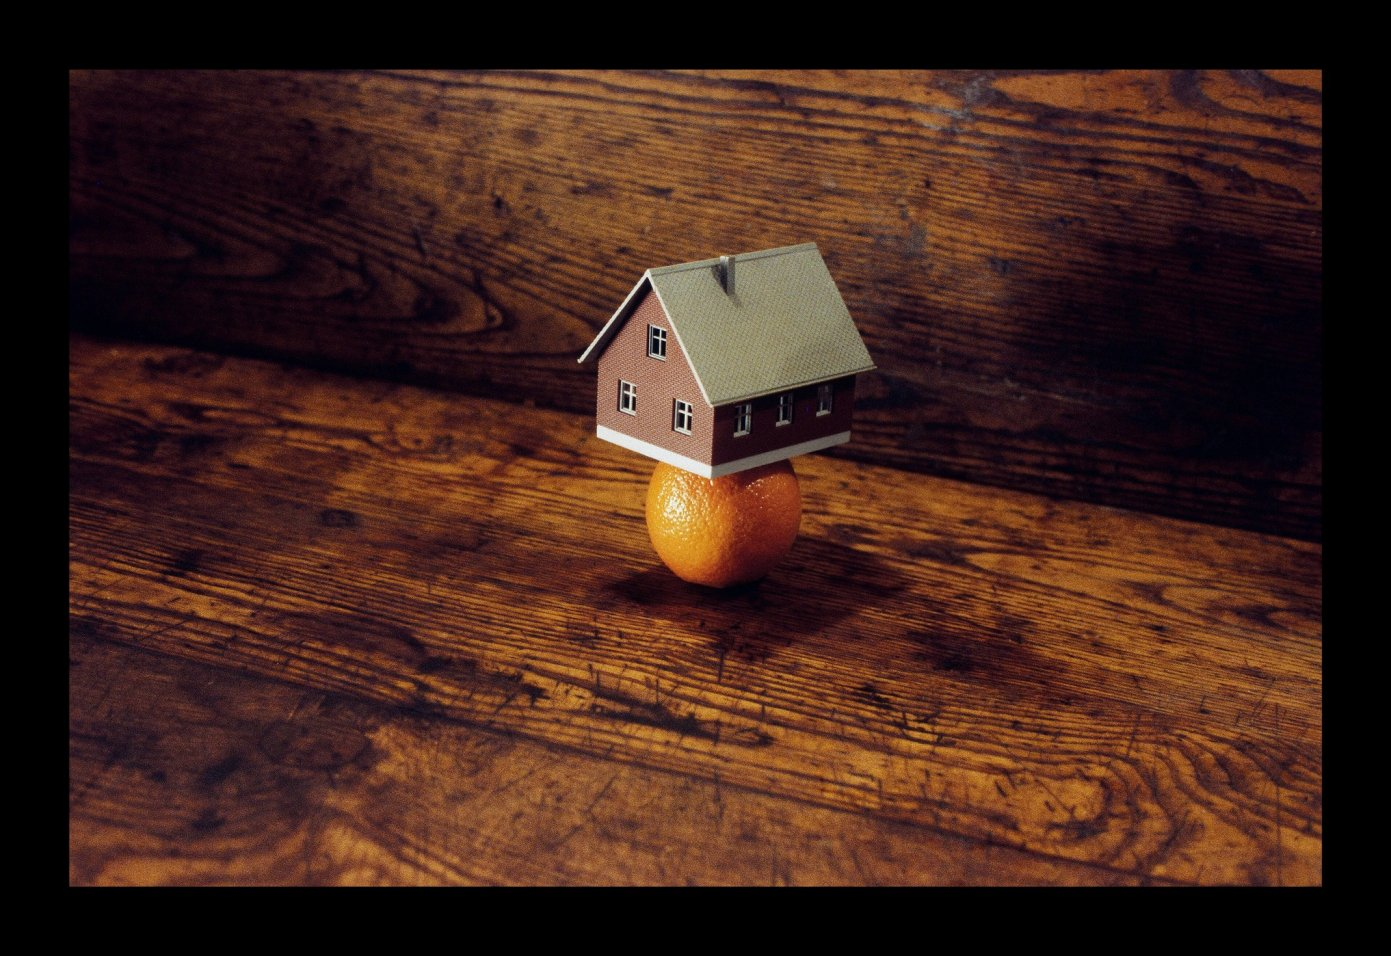 Home (2007) - Manuel Saiz